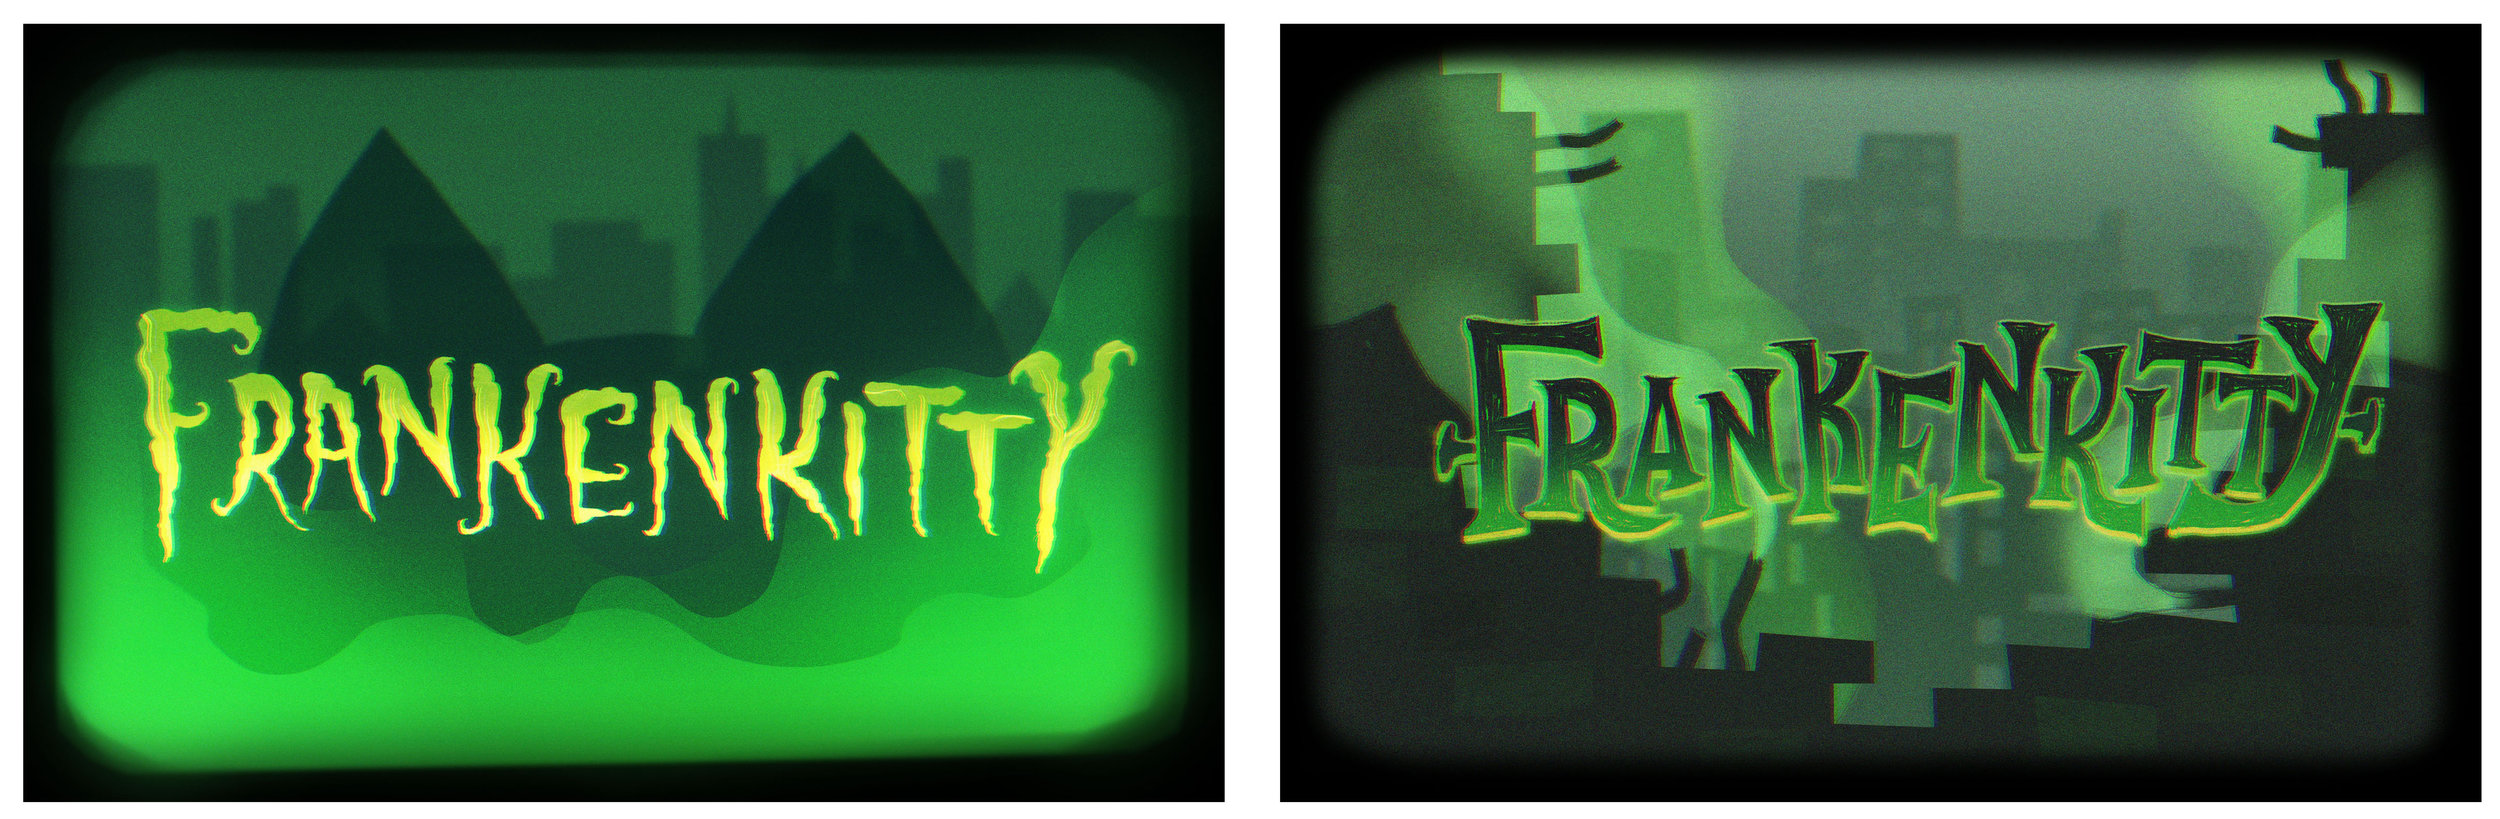 dr_frankenkitty_logo_ideas_crop.jpg